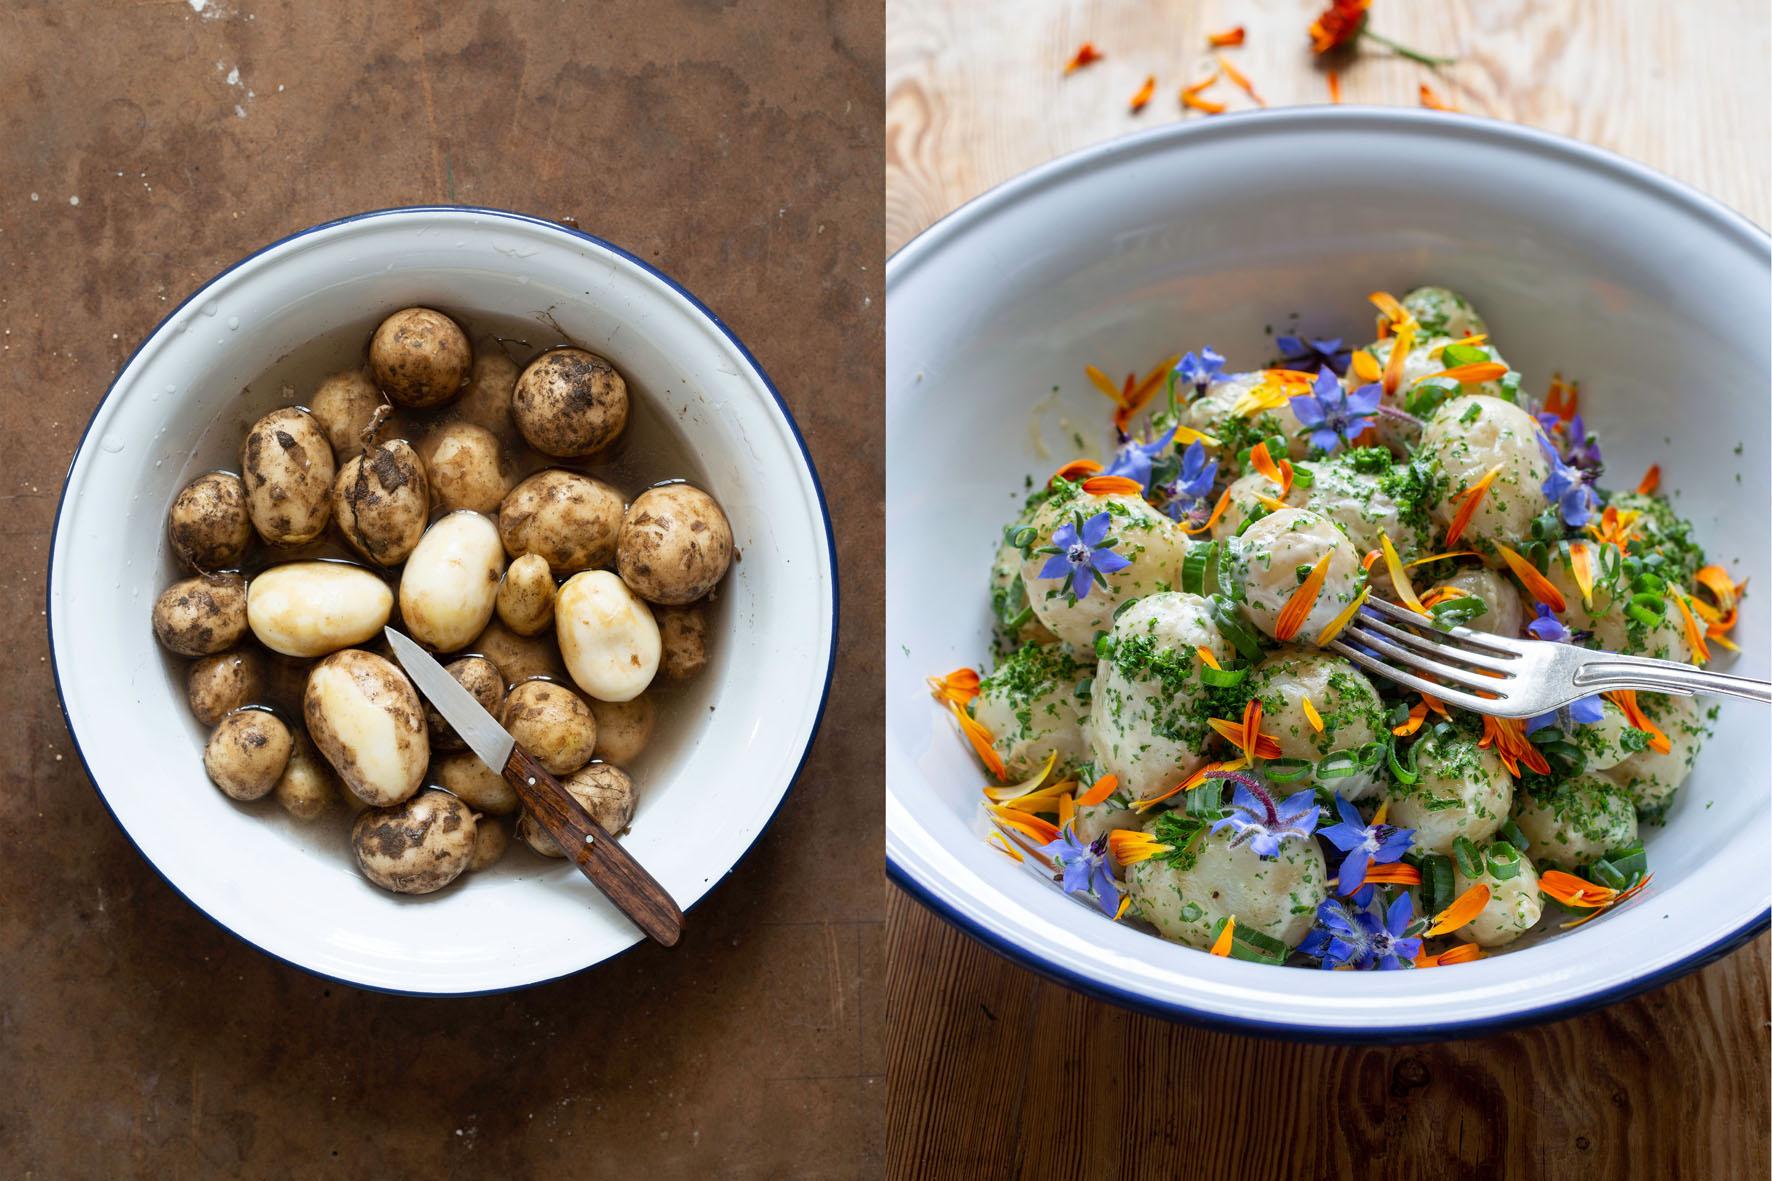 skogtillbord-potatissallad-caesar- aug21